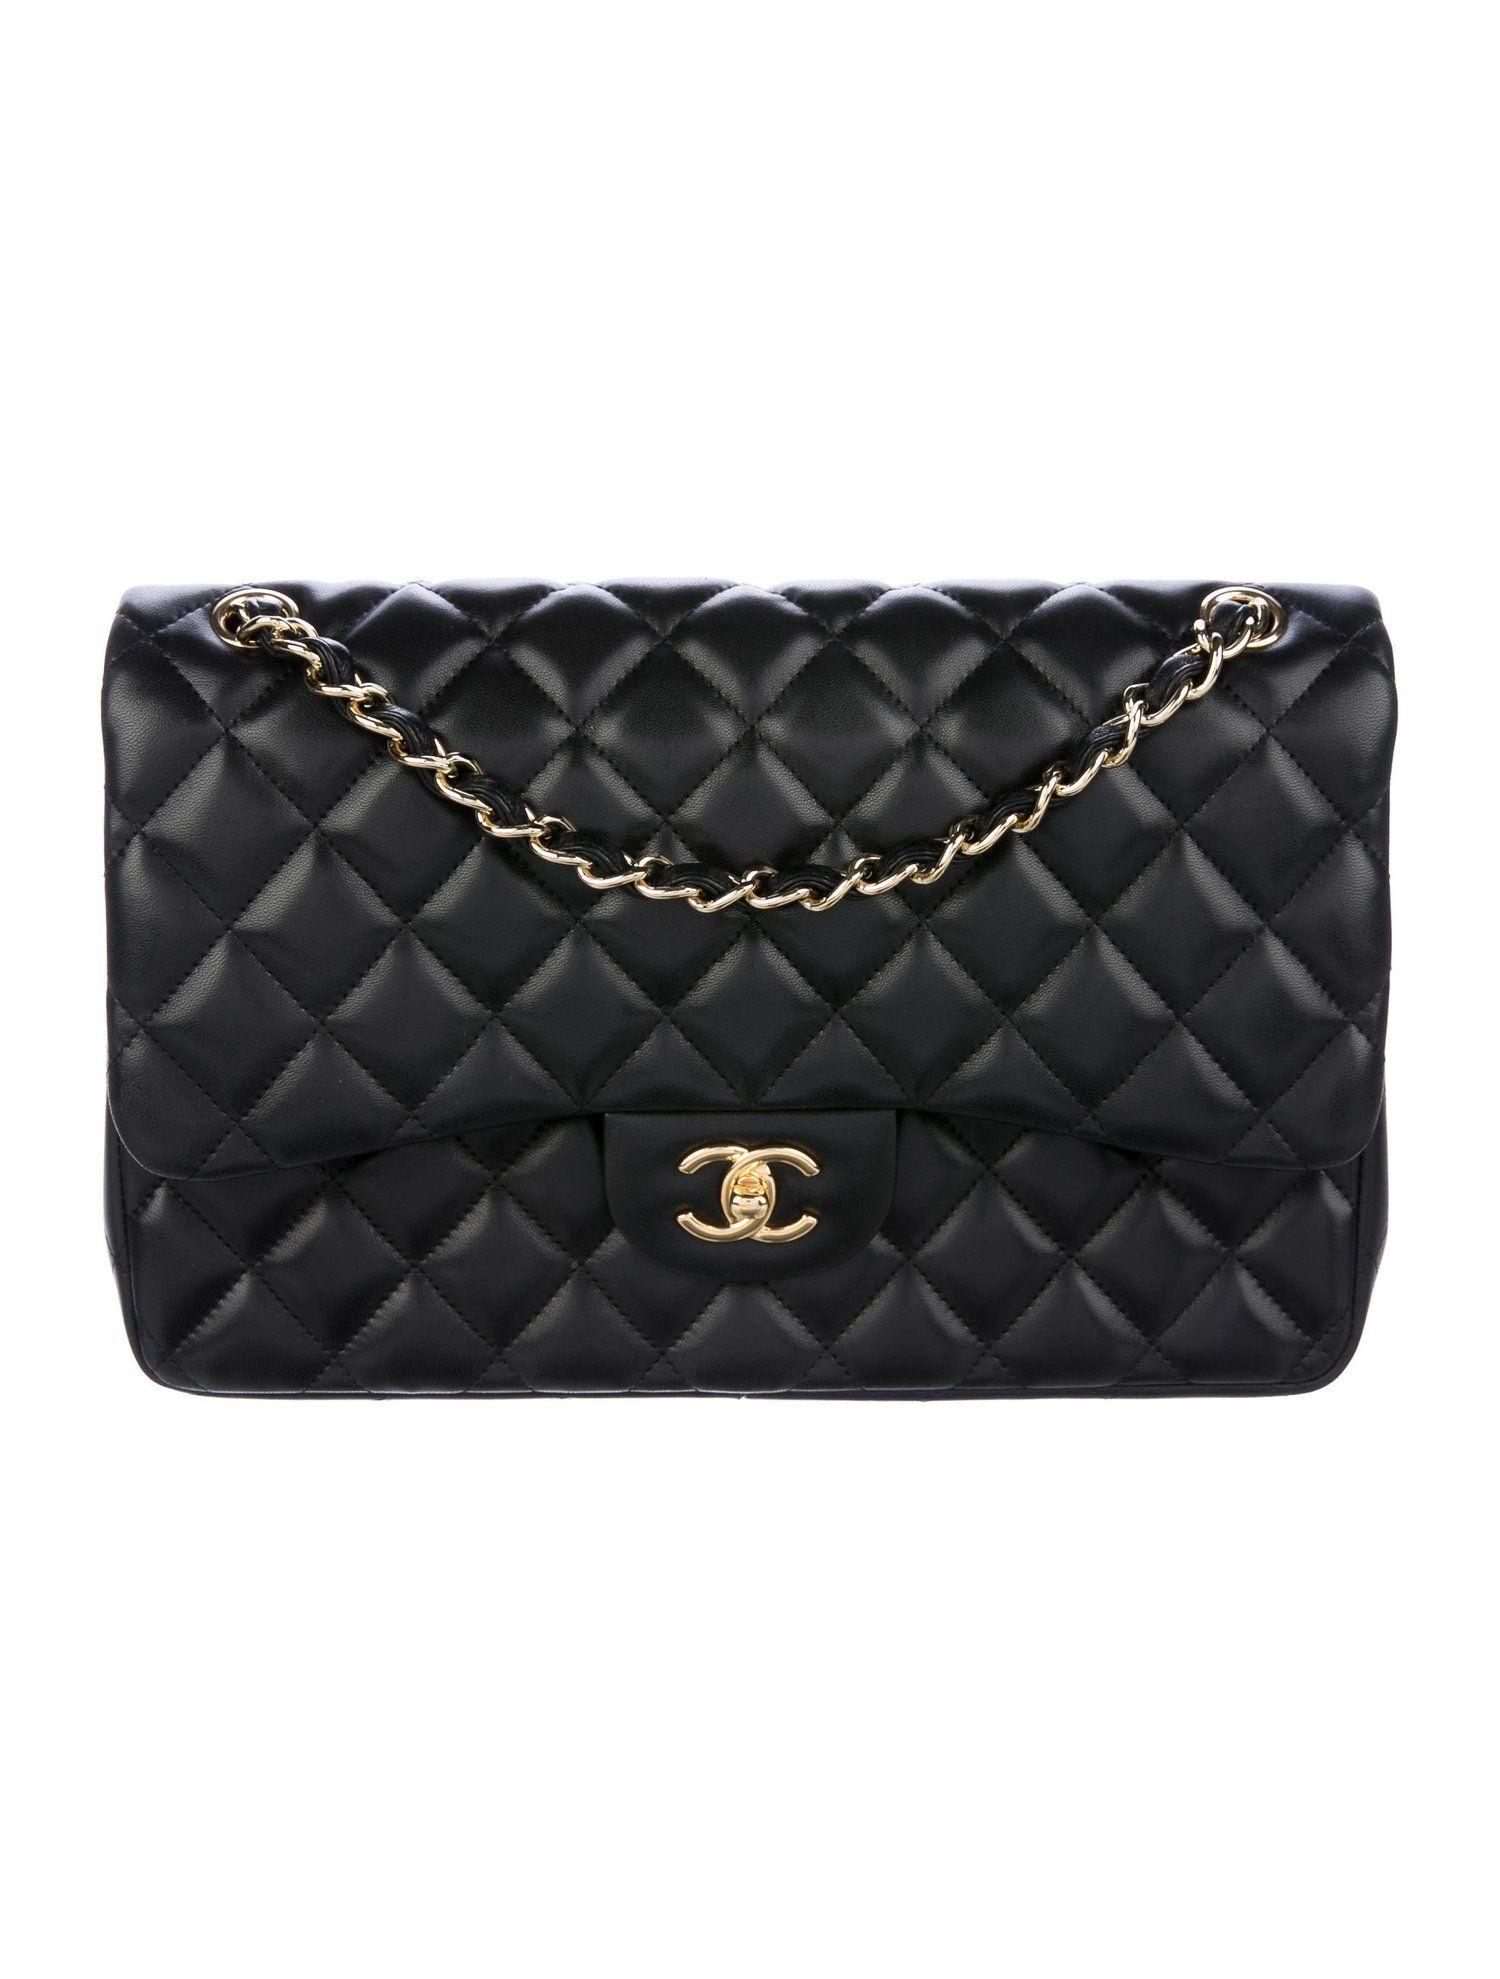 14bc32063ac9 Chanel Classic Jumbo Double Flap Bag - Handbags - CHA229554 | The RealReal